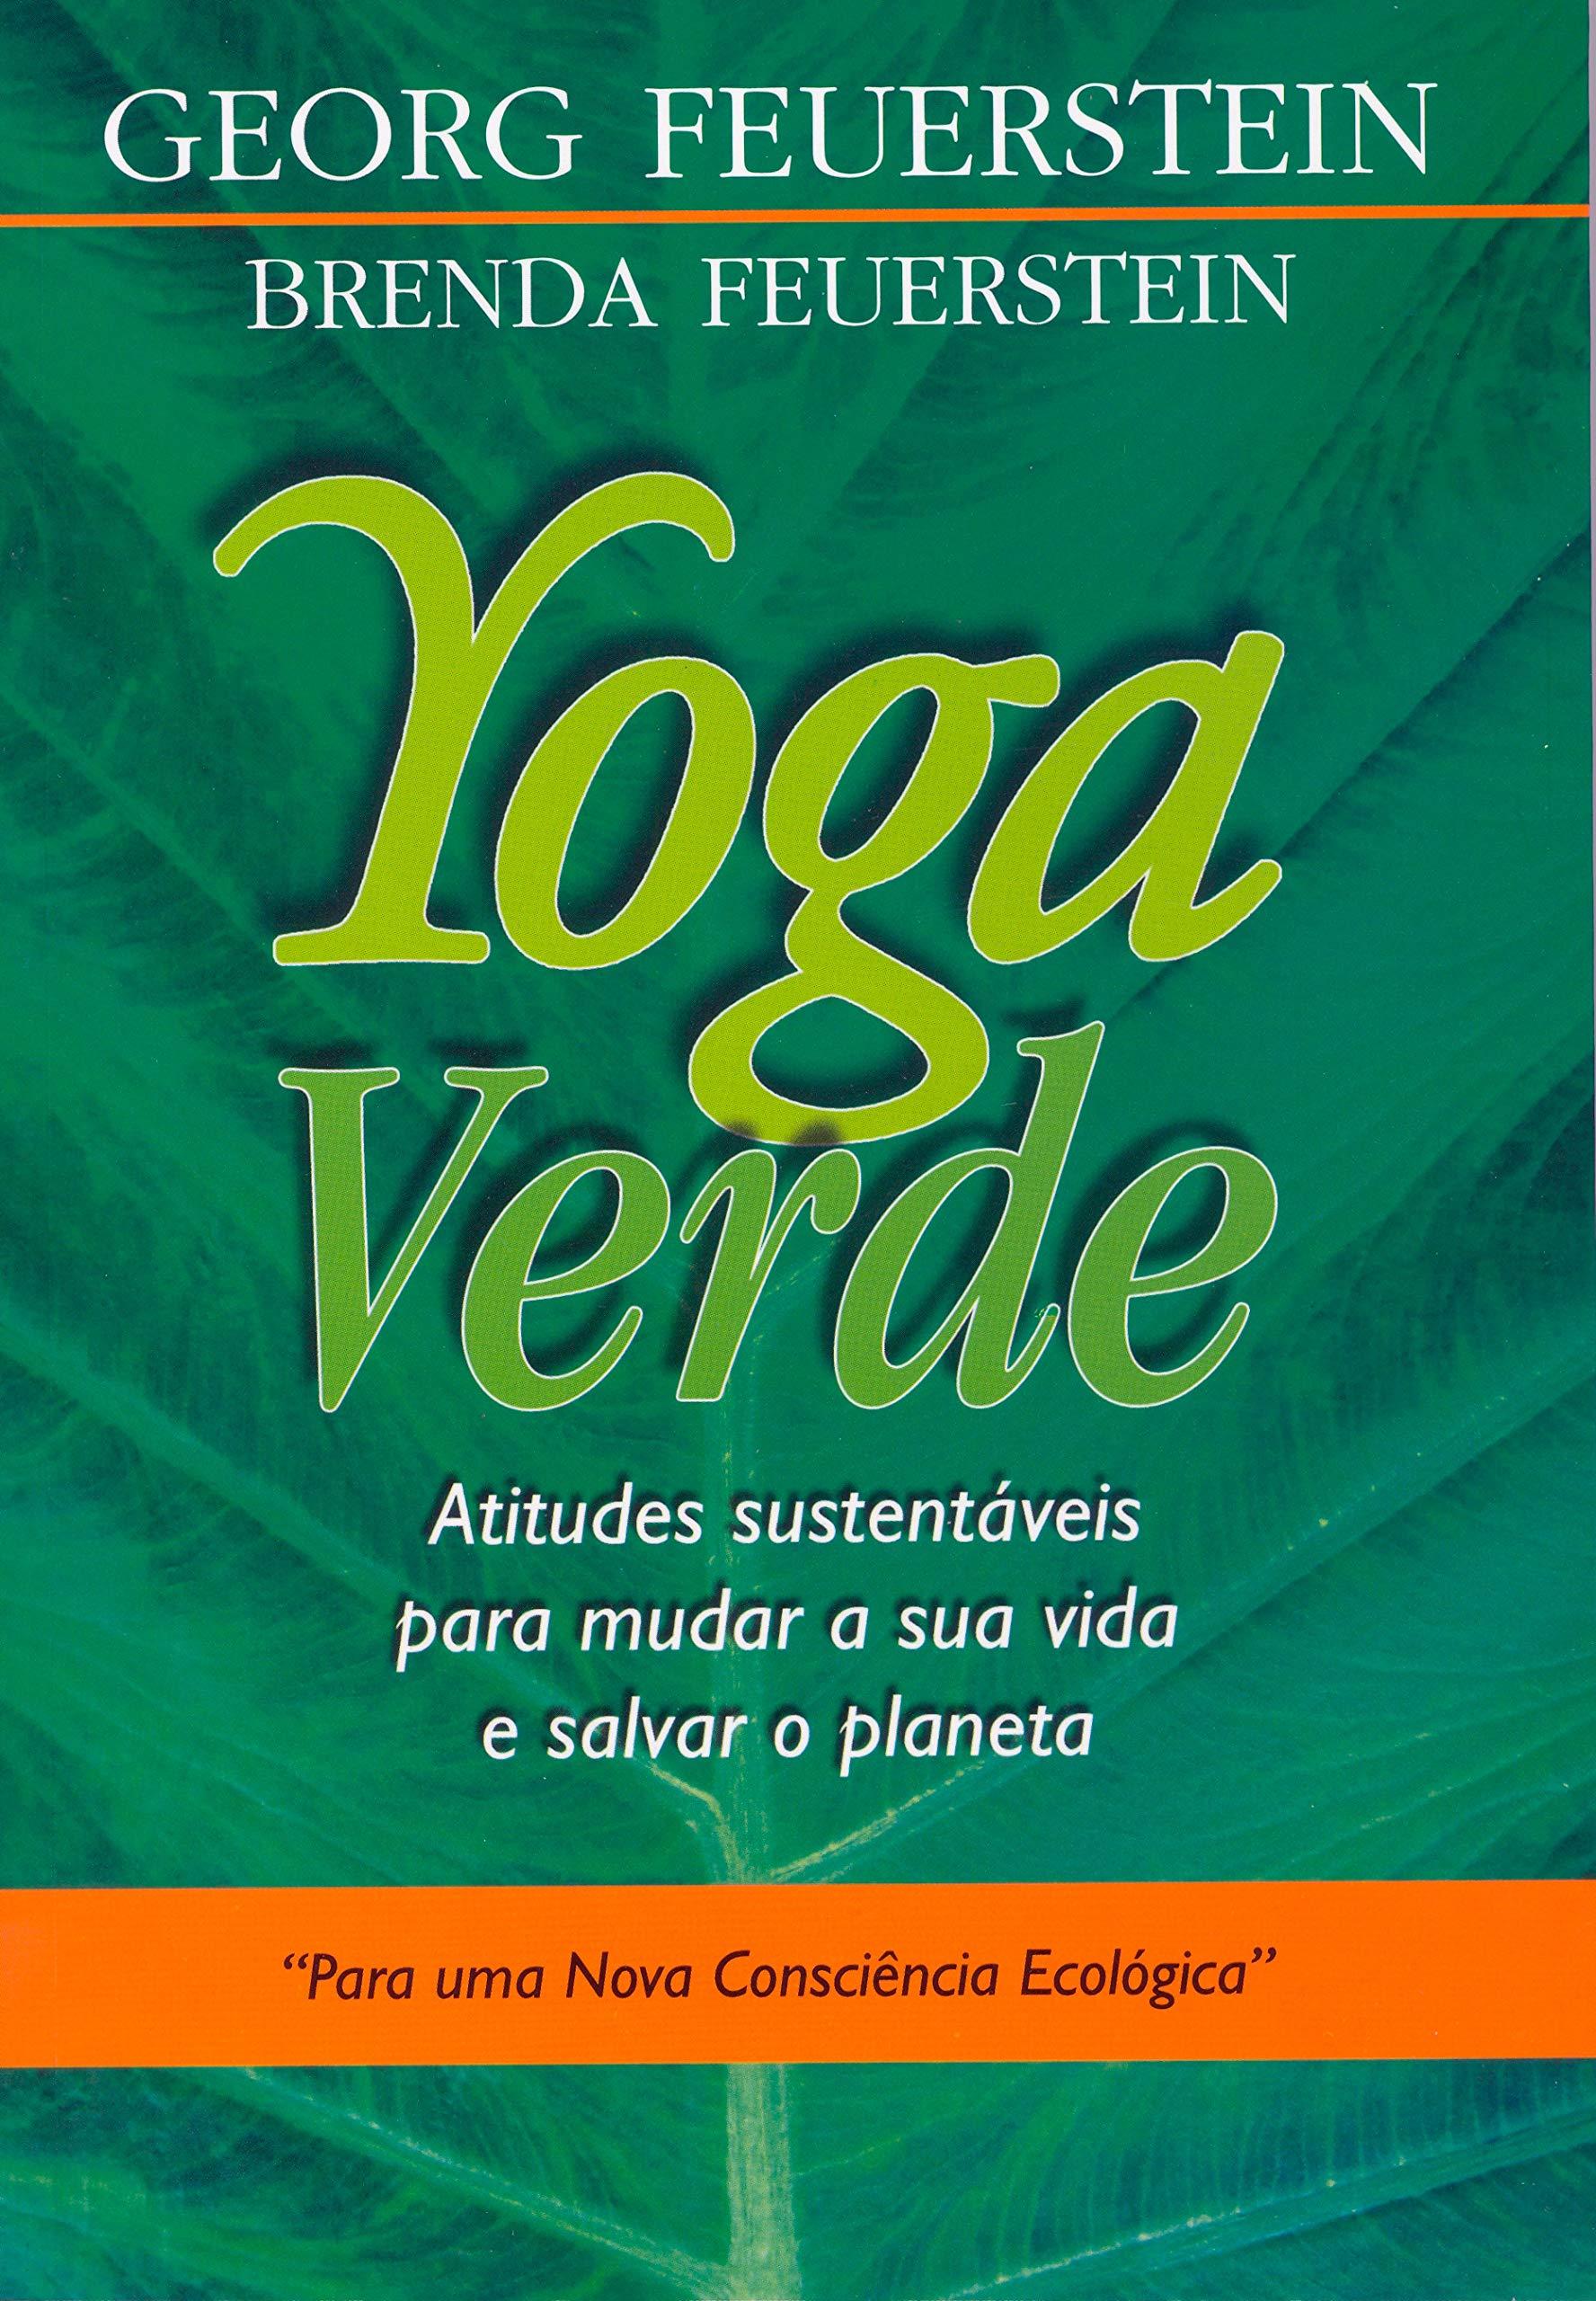 Yoga Verde: George Feuerstein: 9788531516320: Amazon.com: Books